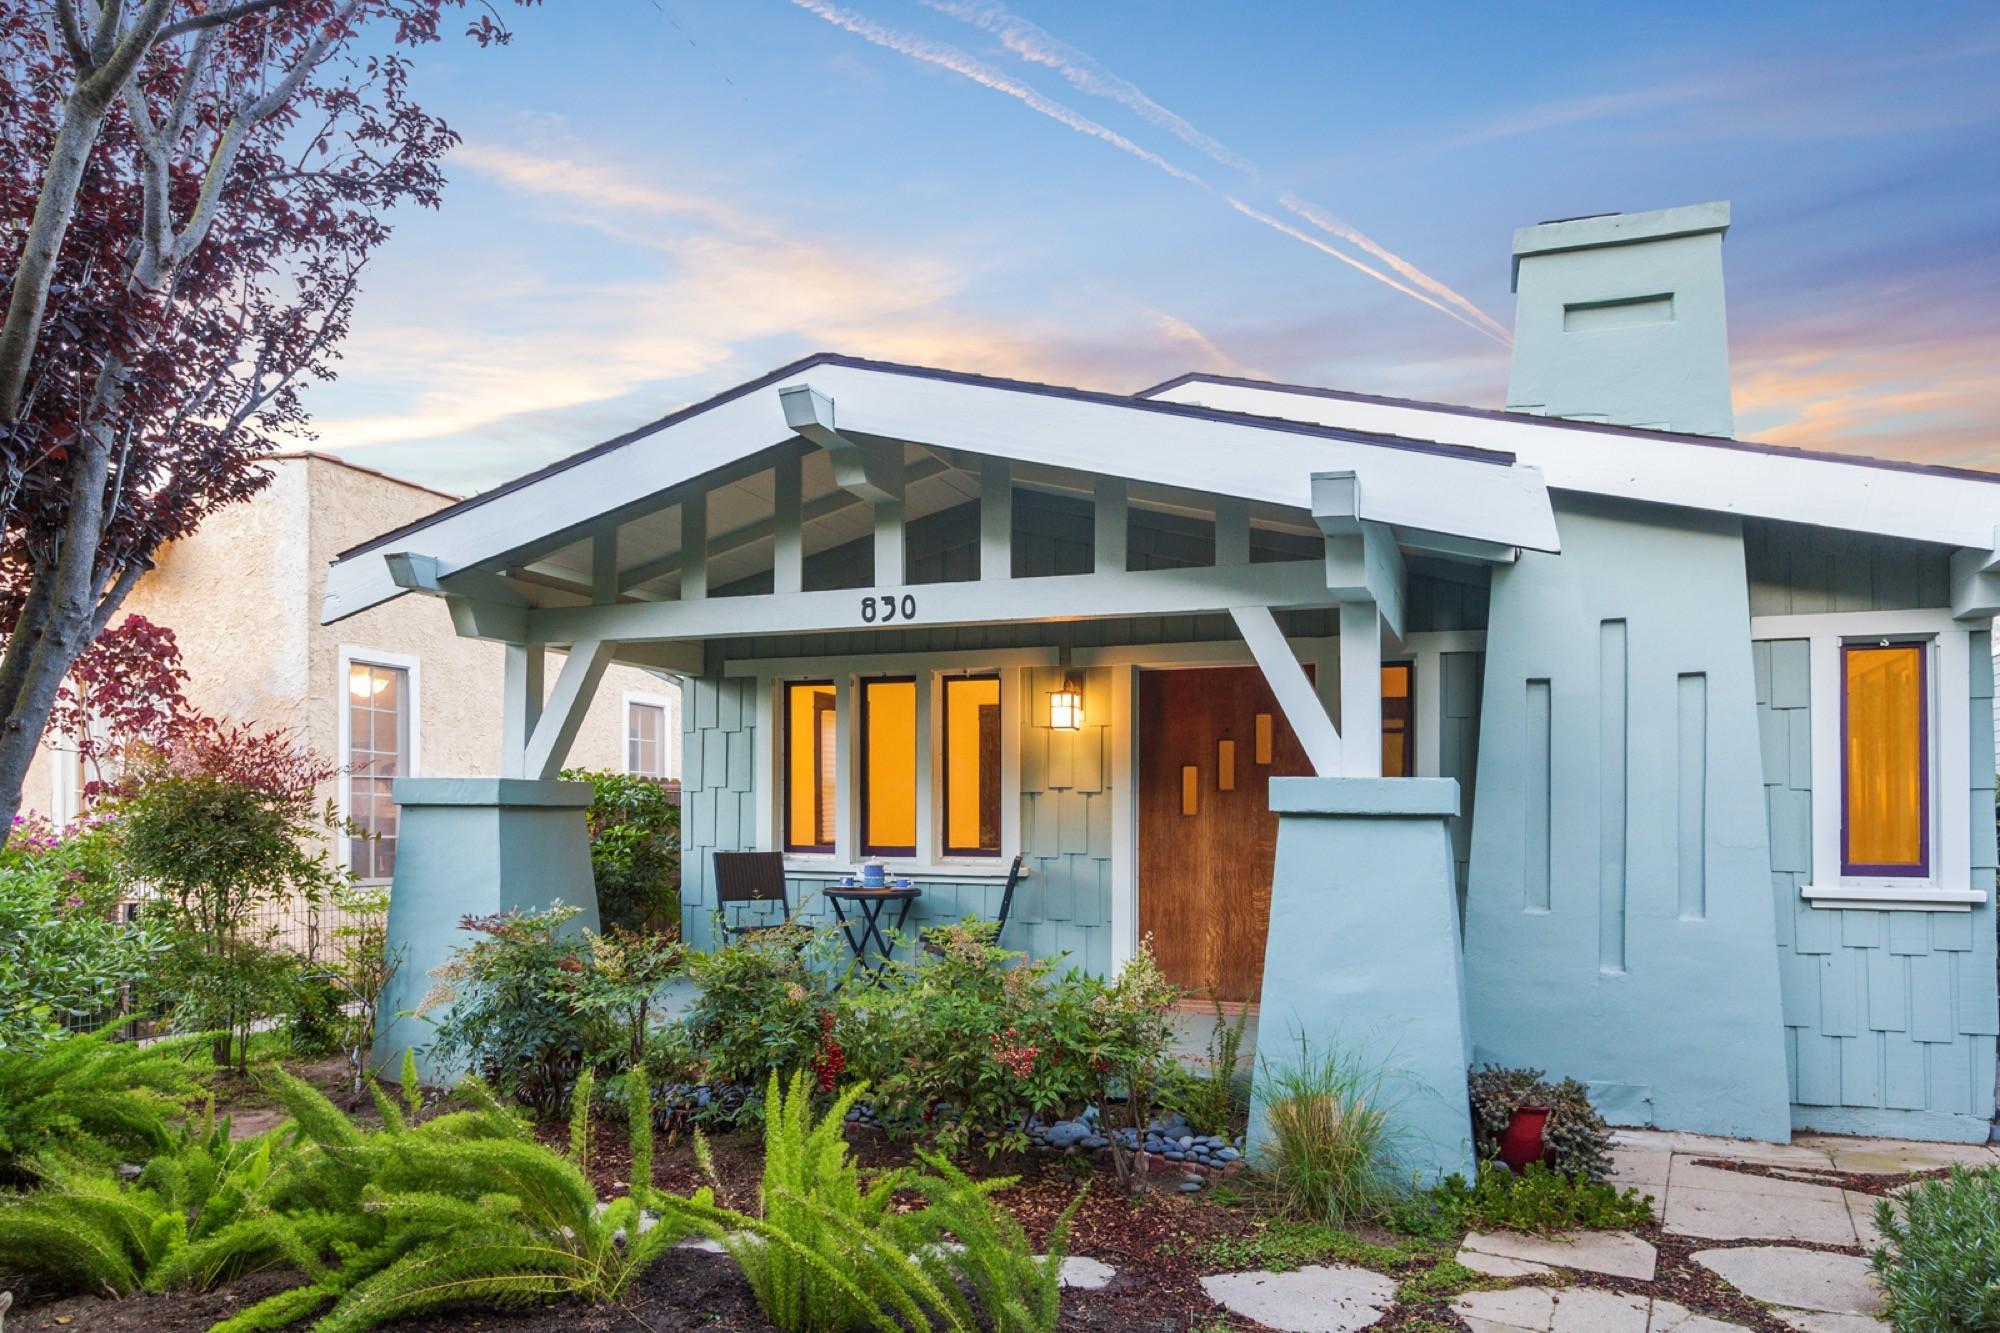 830 Marco Pl, Venice, CA 90291 - Estimate and Home Details | Trulia